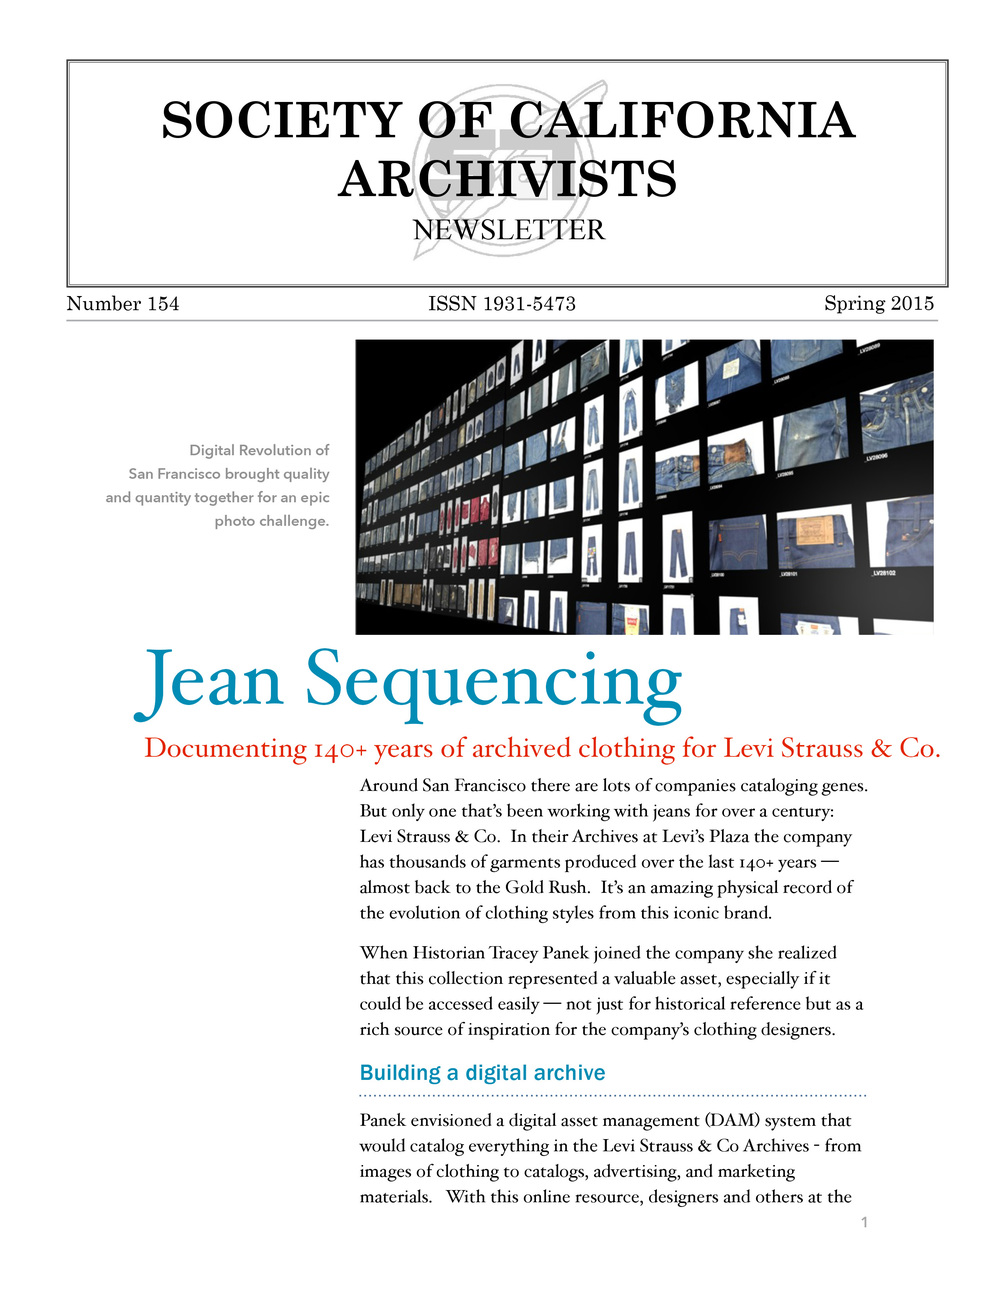 Levis_archivist_page1.jpg